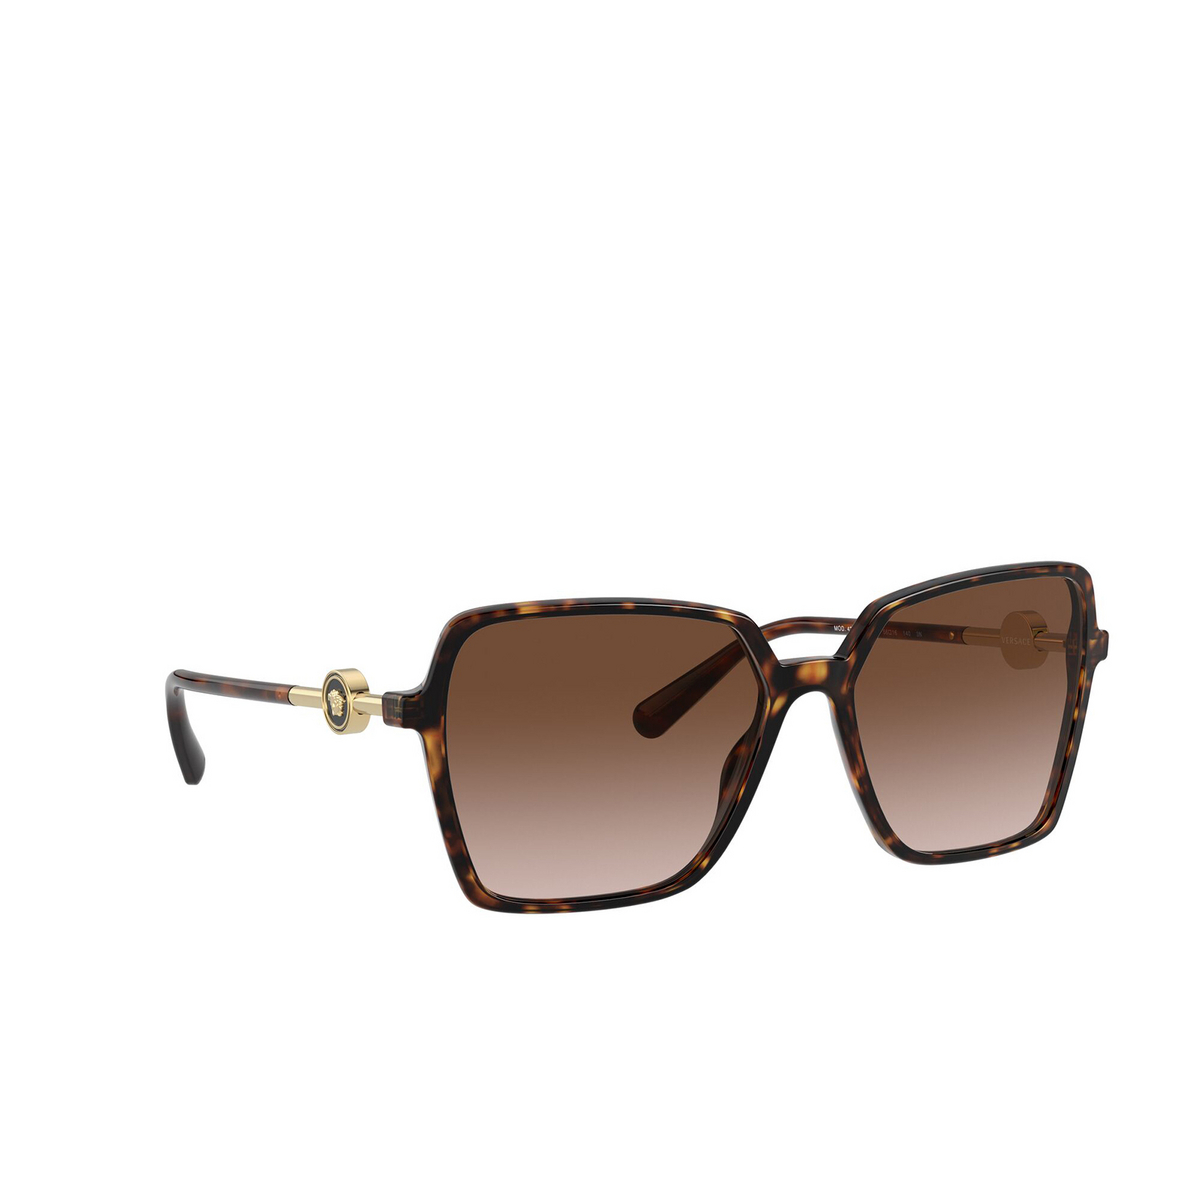 Versace® Square Sunglasses: VE4396 color Havana 108/13 - three-quarters view.